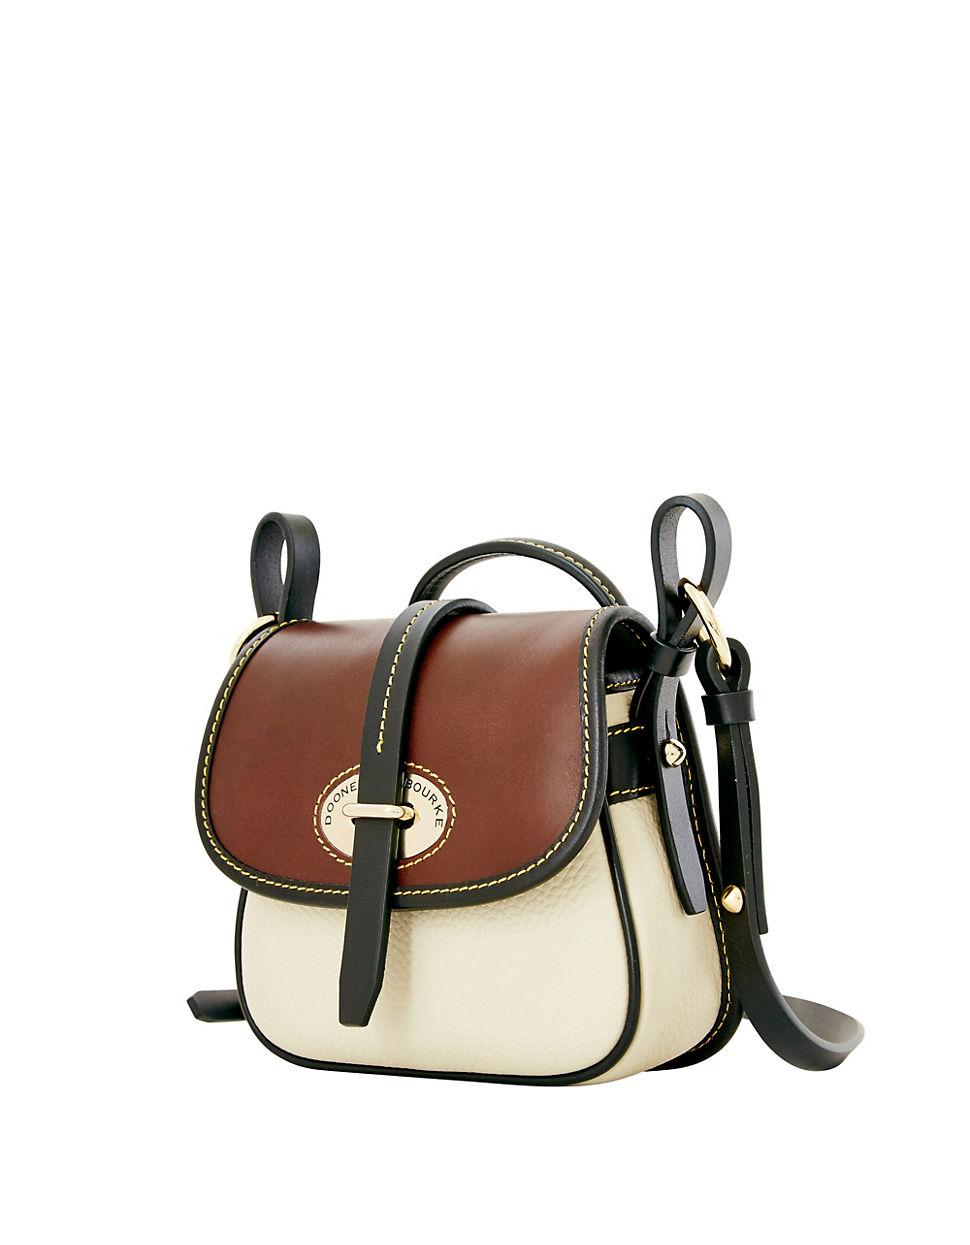 Dooney Bourke Verona Christina Leather Crossbody Bag In Brown Lyst